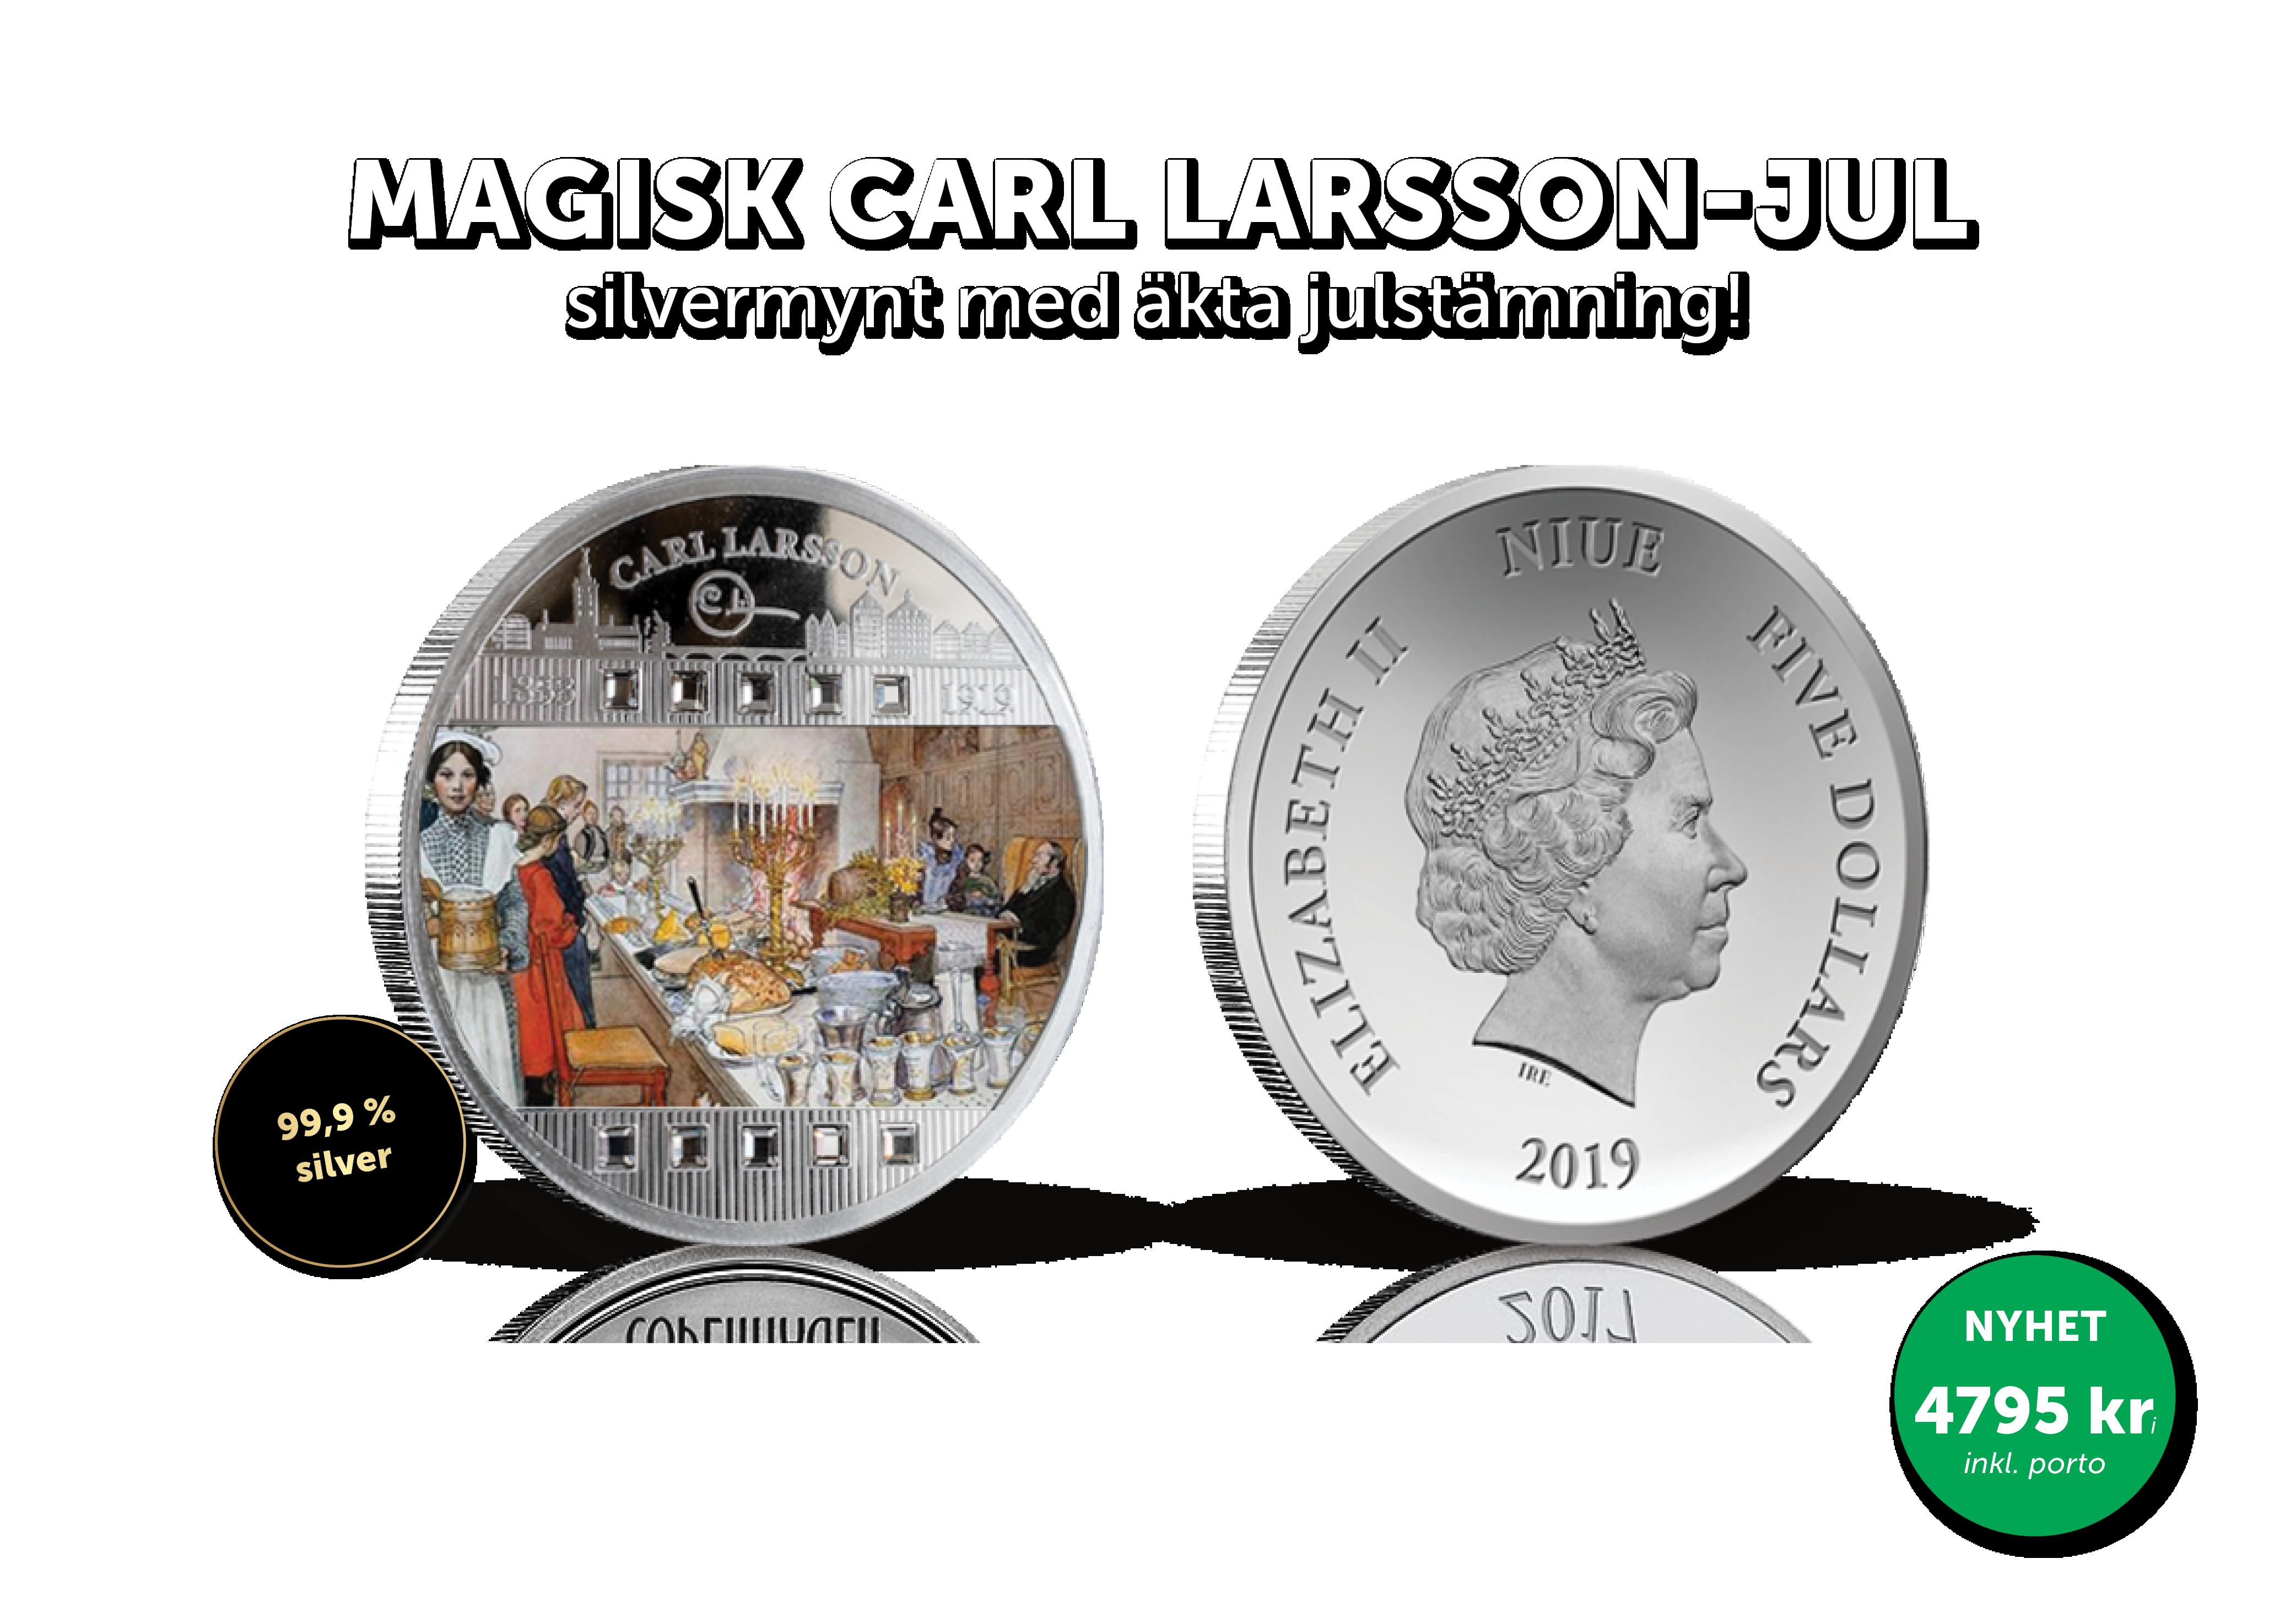 Magisk Carl Larsson-jul